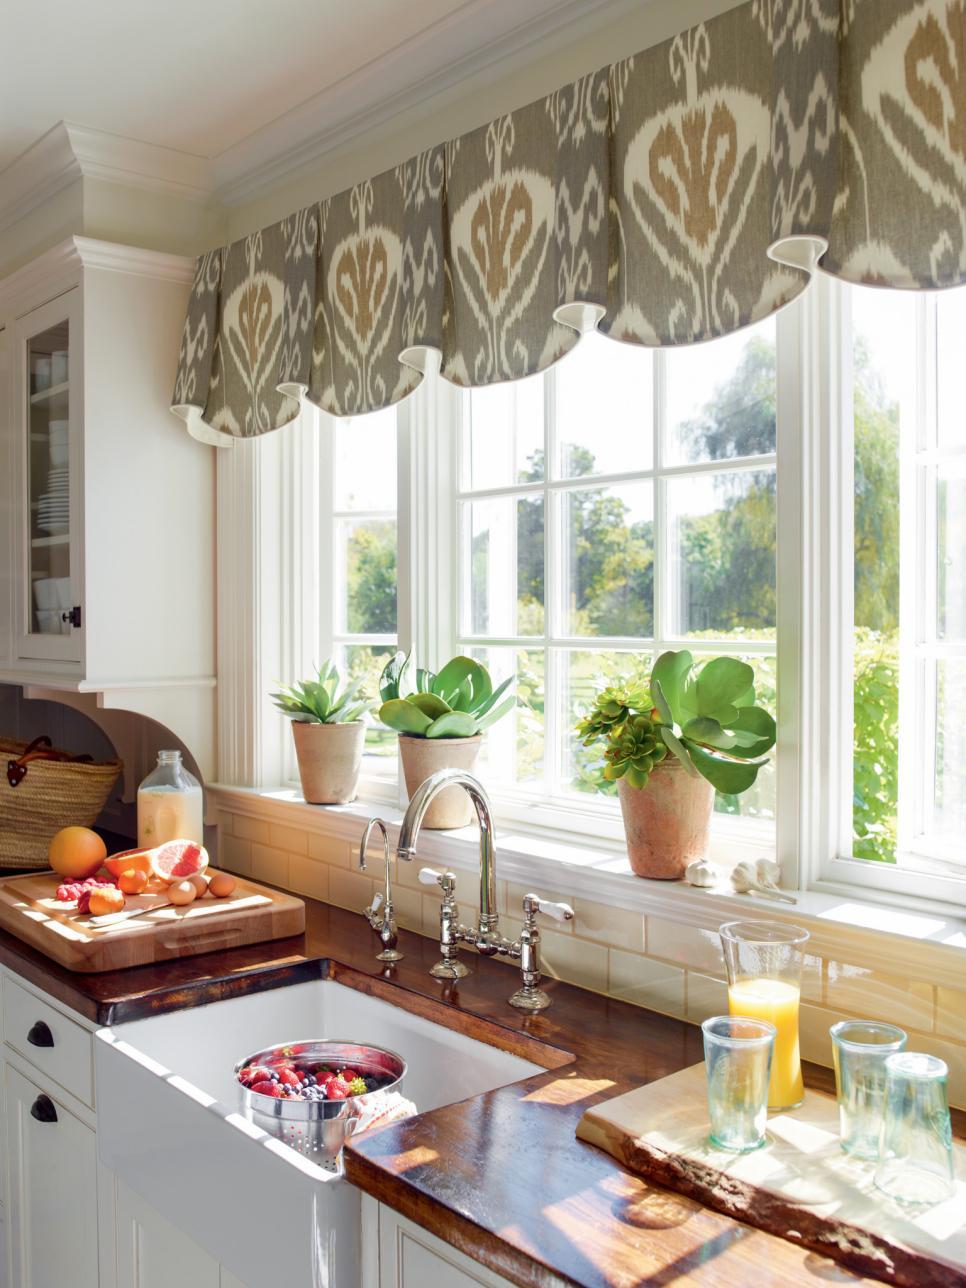 vindue-behandling-ideer-køkken-med-hensyn-til-køkken-vindue-ideer-top-10-smarte-køkken-vindue-ideer